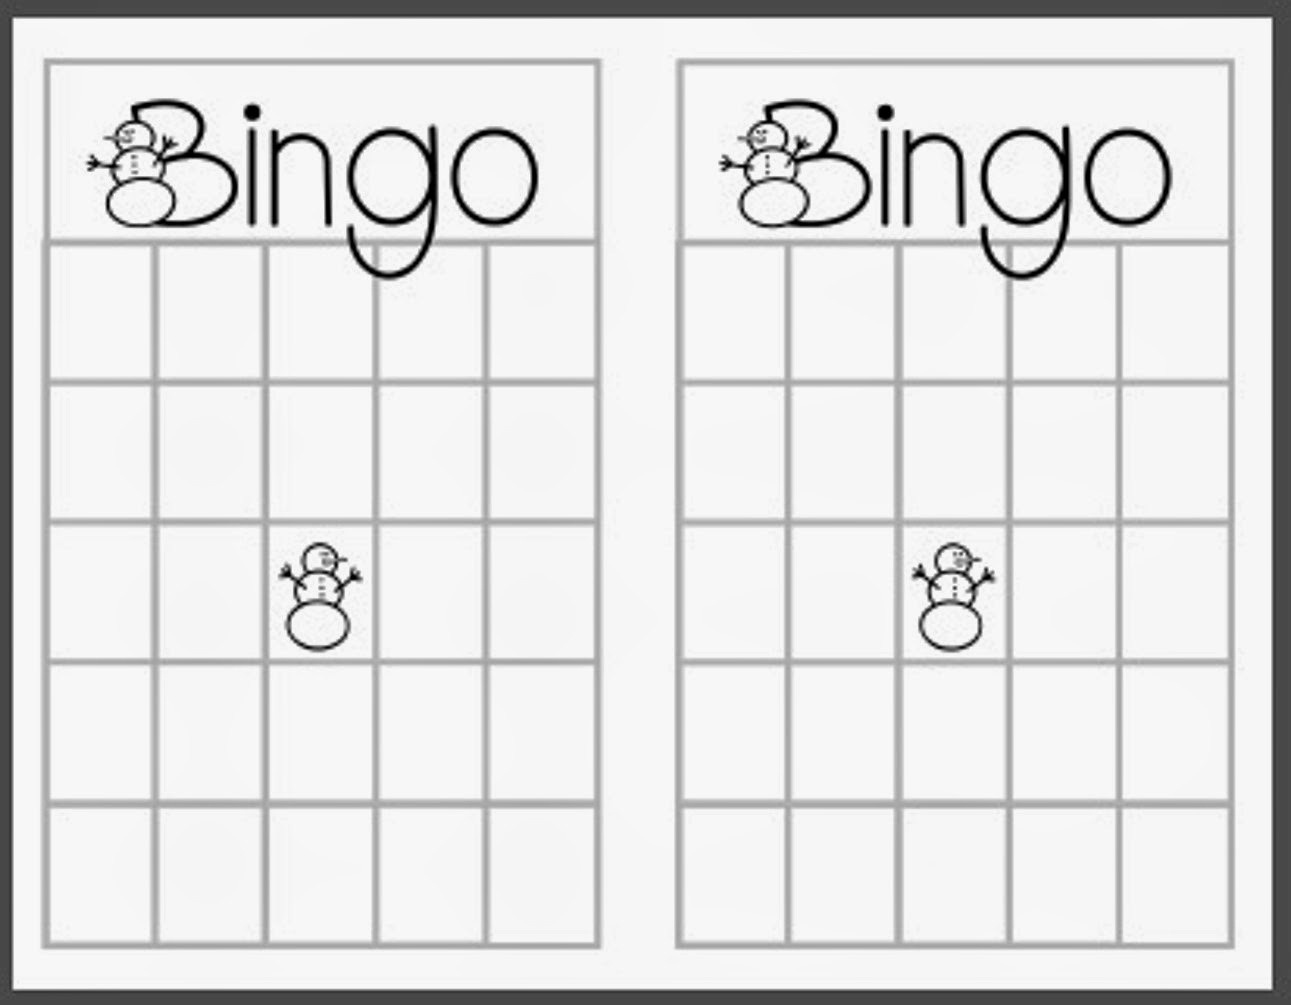 023 Template Ideas Blank Bingo Card Awesome Best Of Free Printable - Free Printable Blank Bingo Cards